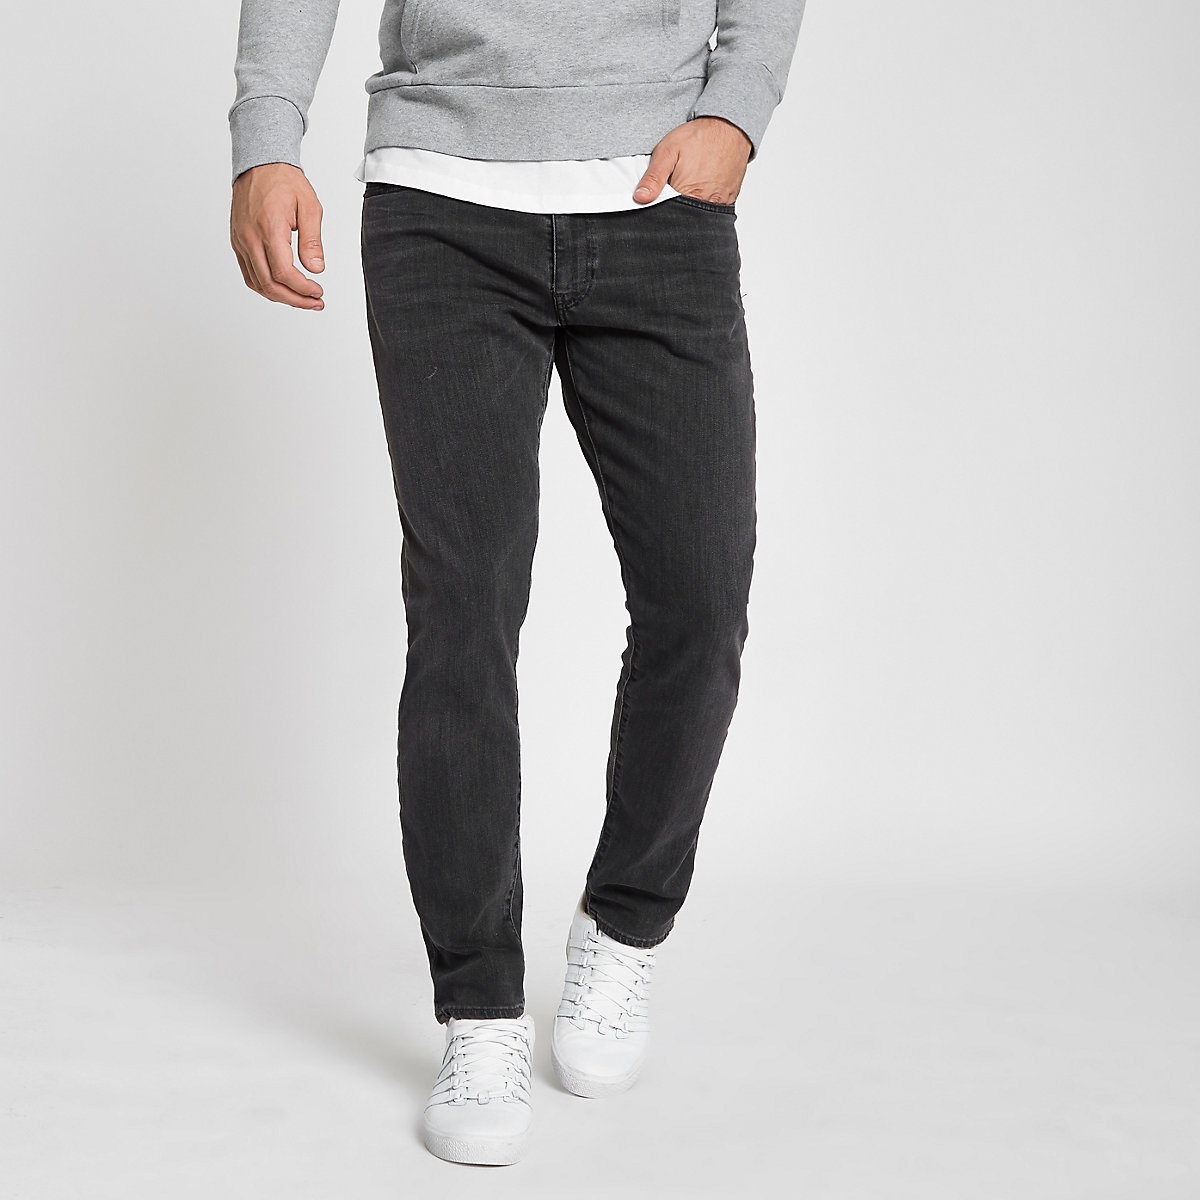 Levi's 512 dark grey slim taper fit jeans